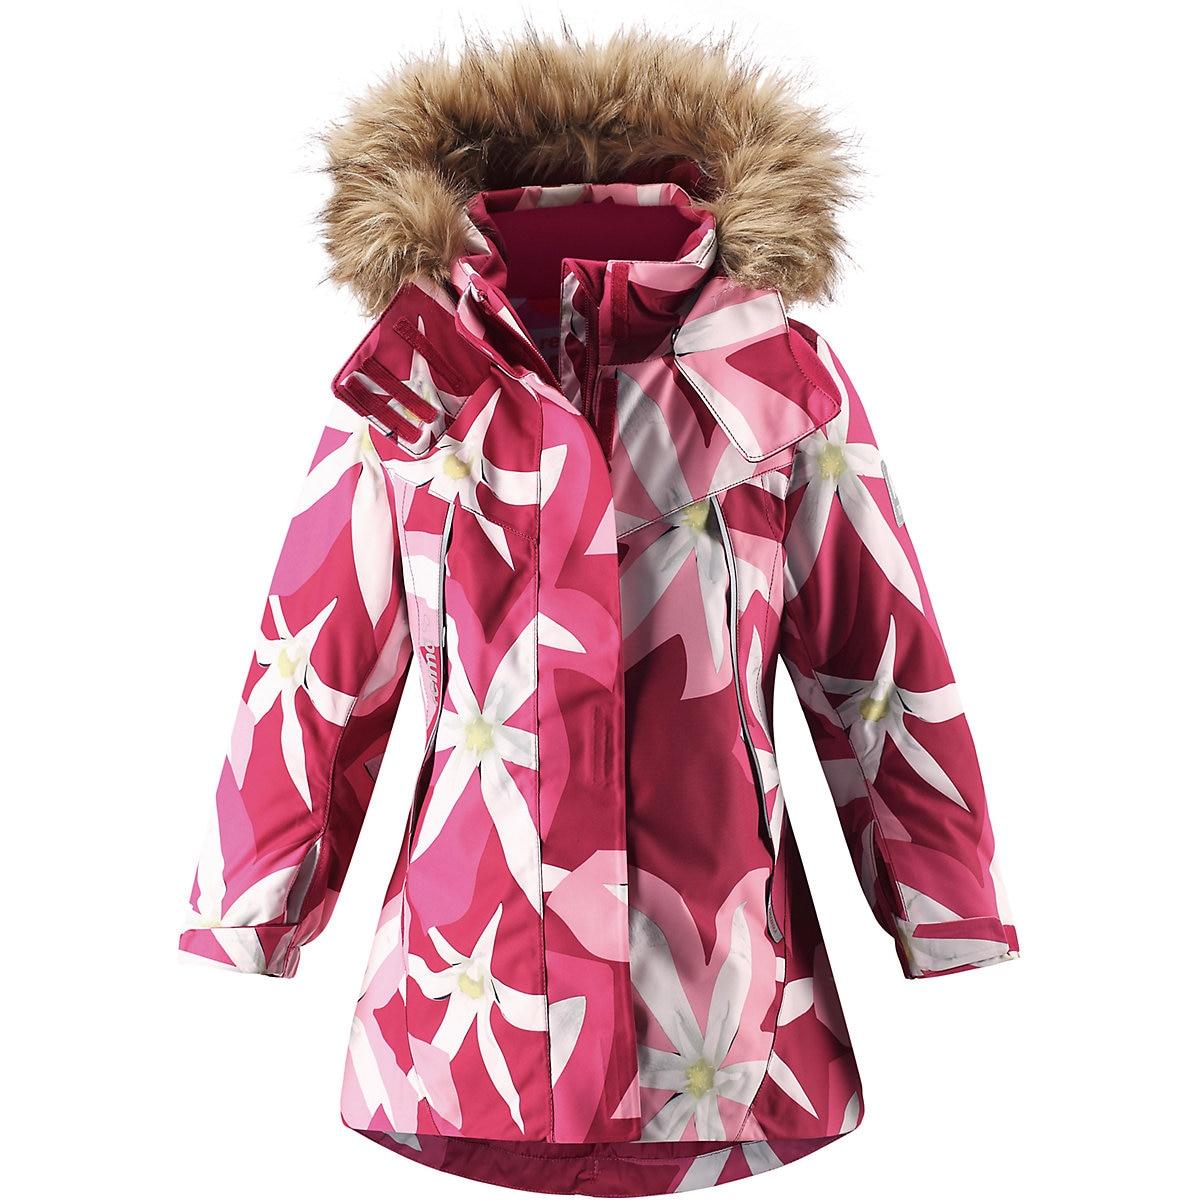 REIMA Jackets & Coats 8688910 for girls baby clothing winter warm boy girl jacket Polyester reima sweaters 8689310 for girls wool warm winter children clothing girl suit jacket